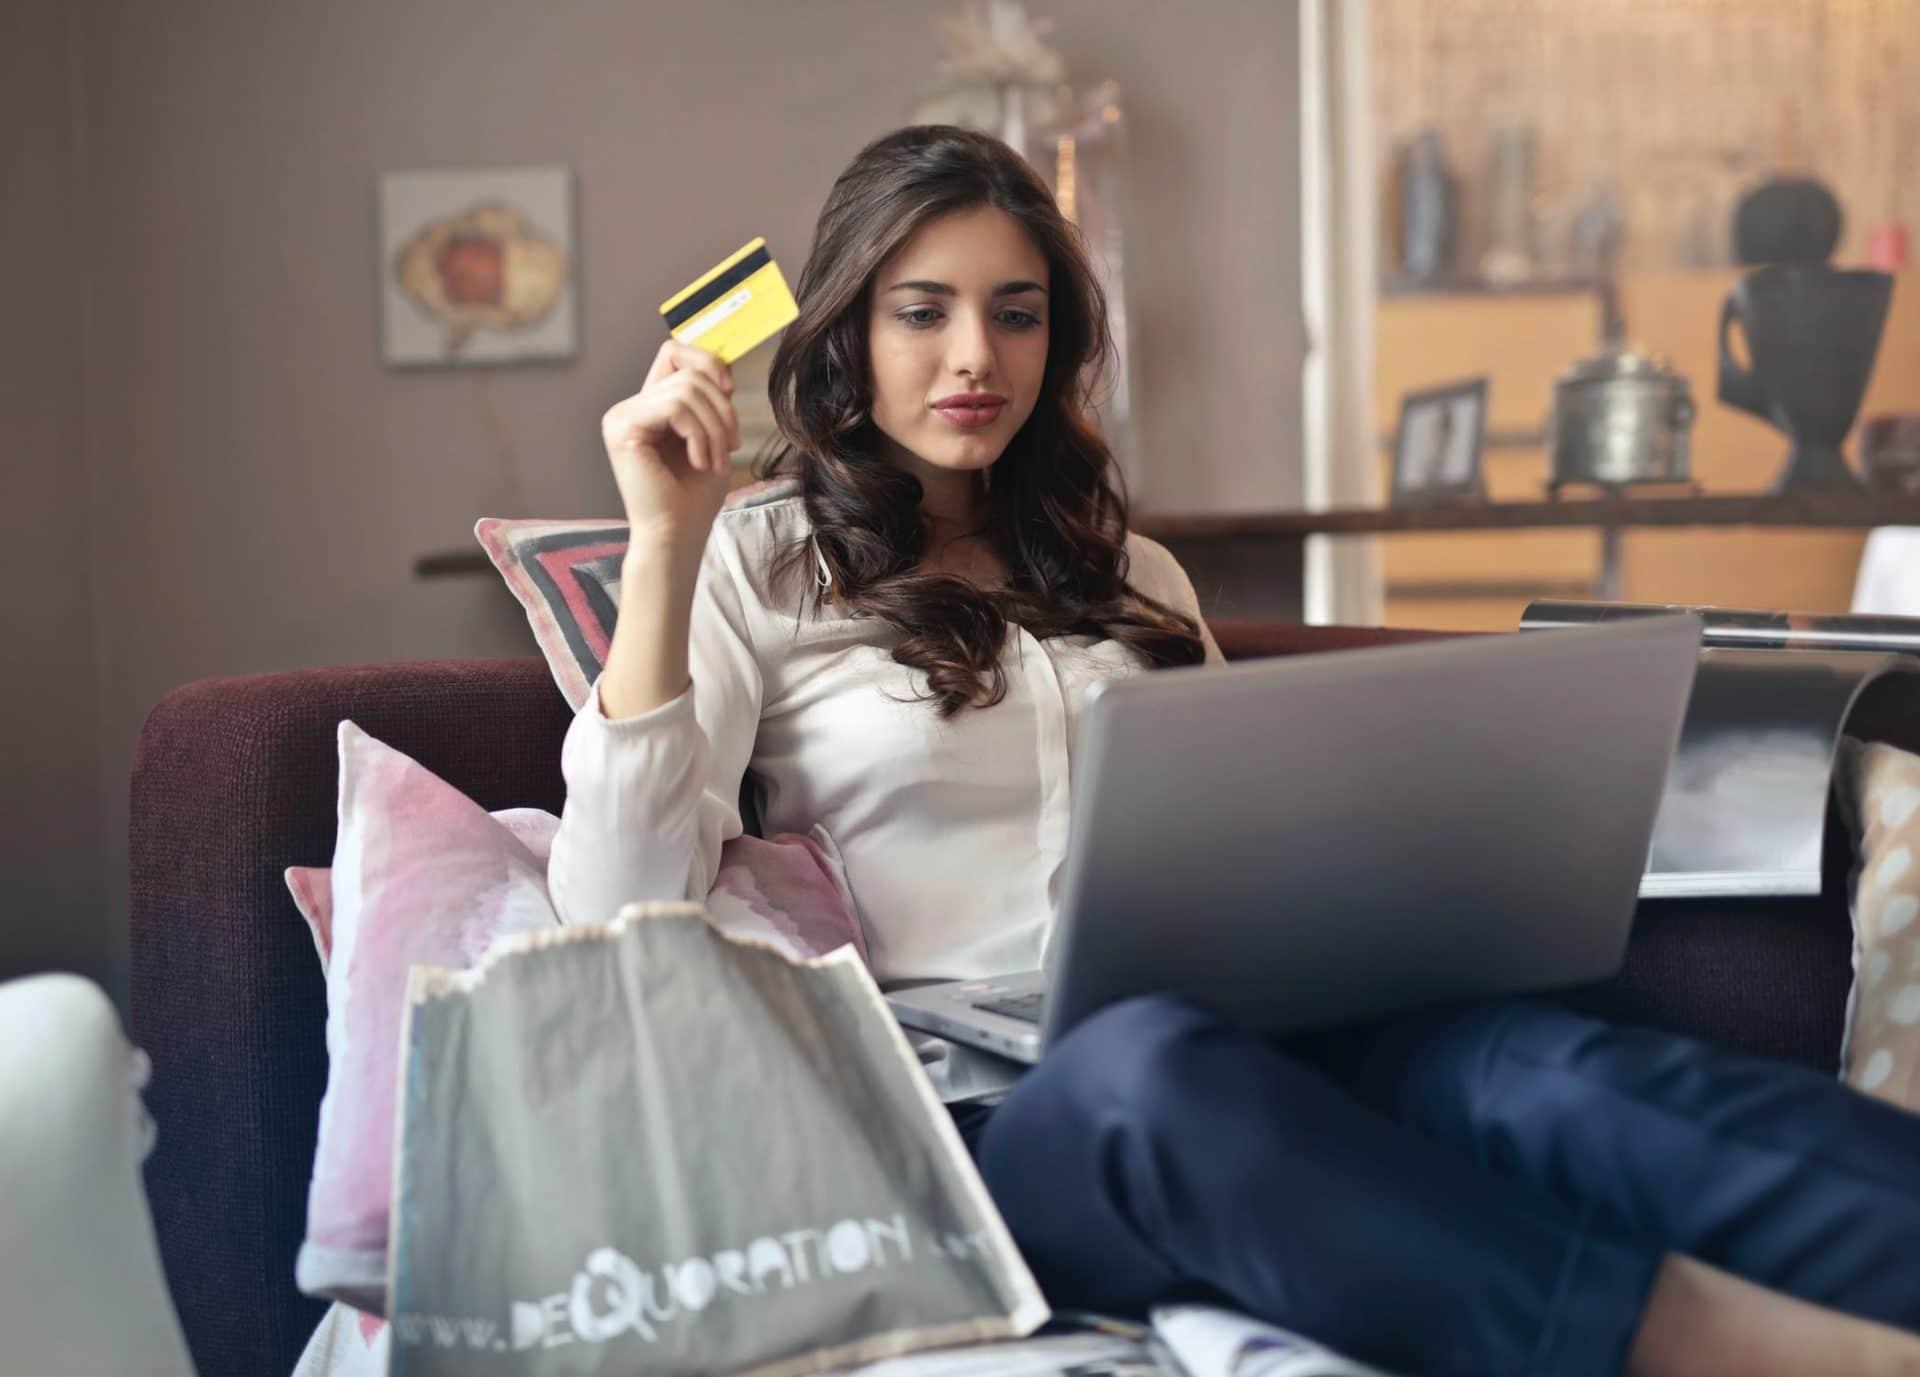 consumer-deciding